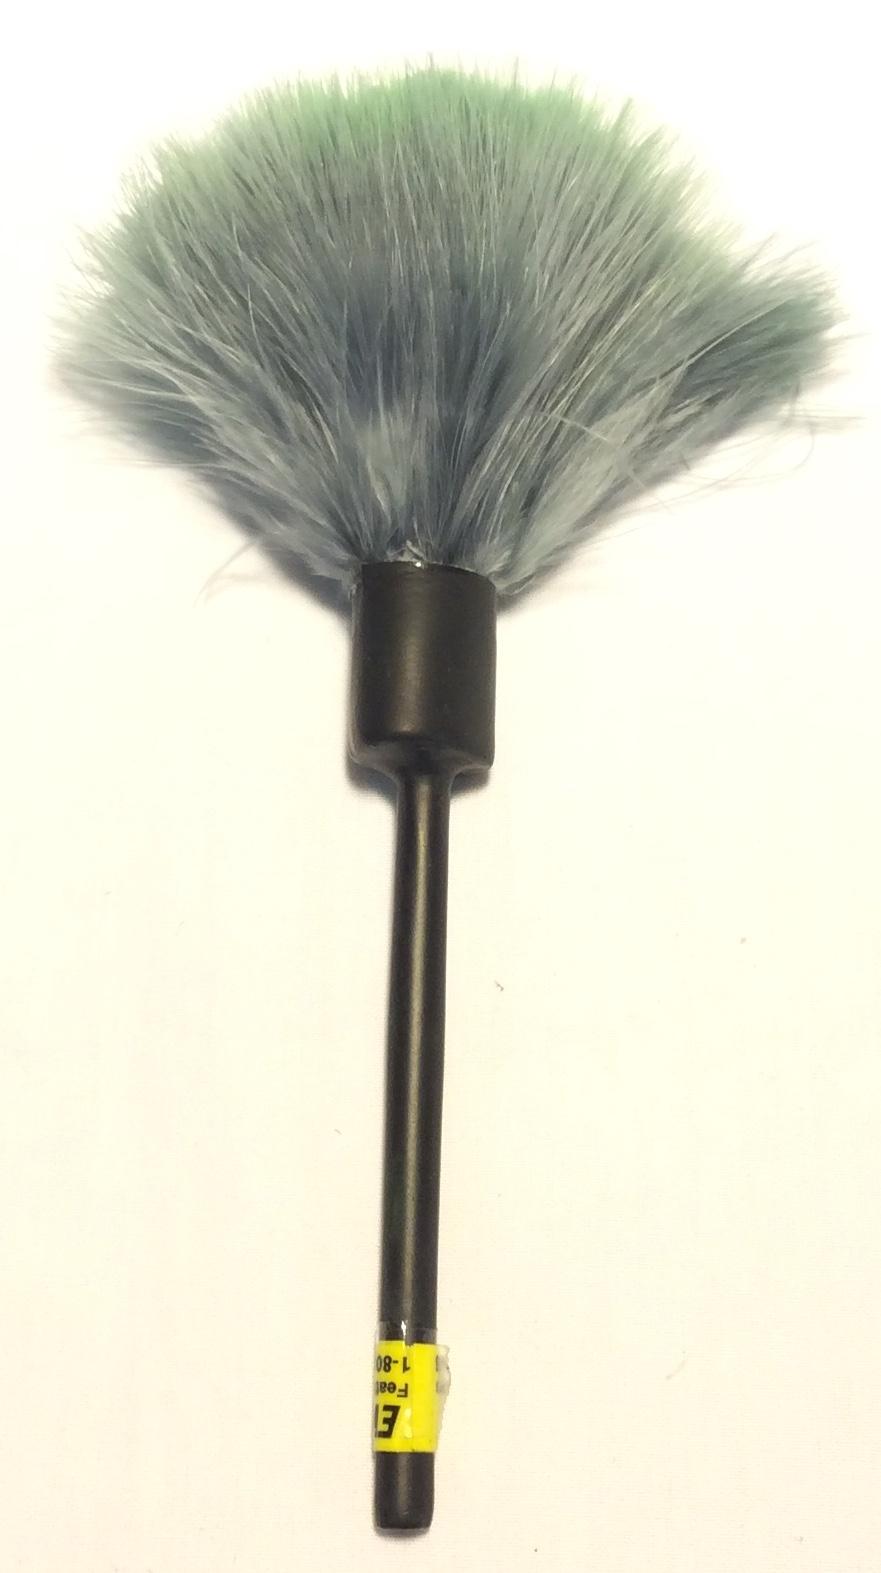 Evident Long black plastic handled